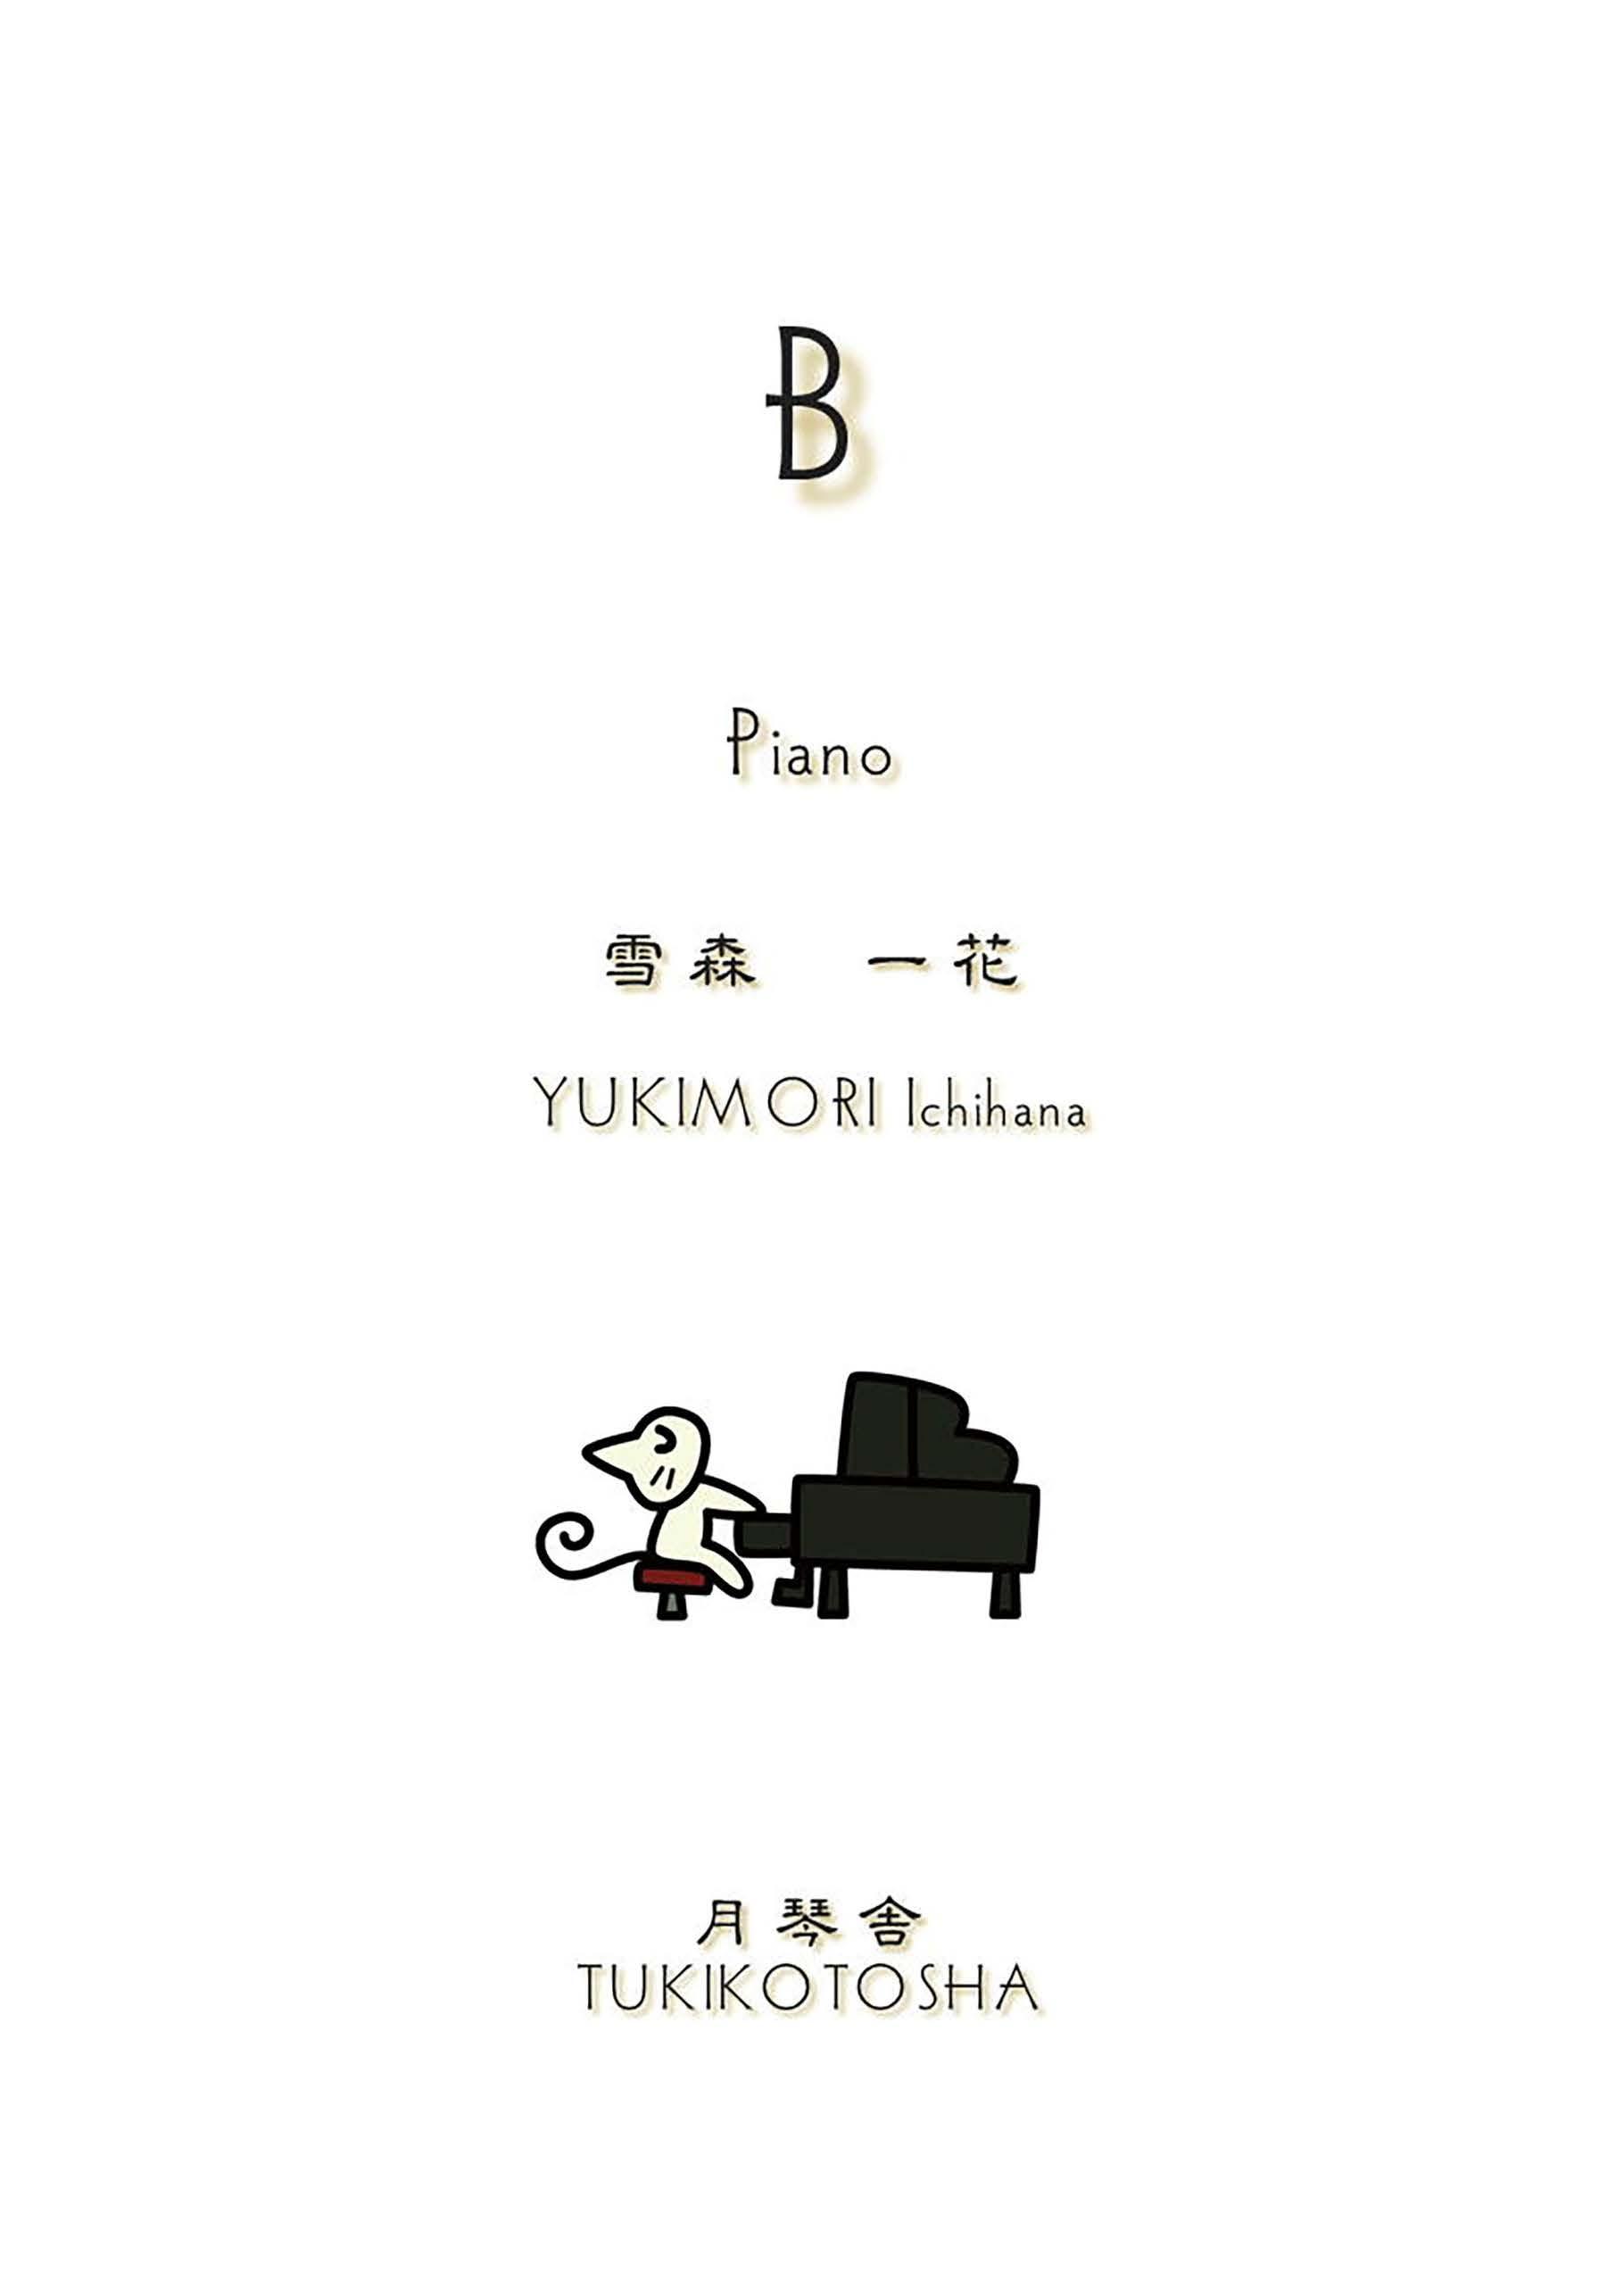 B ピアノ